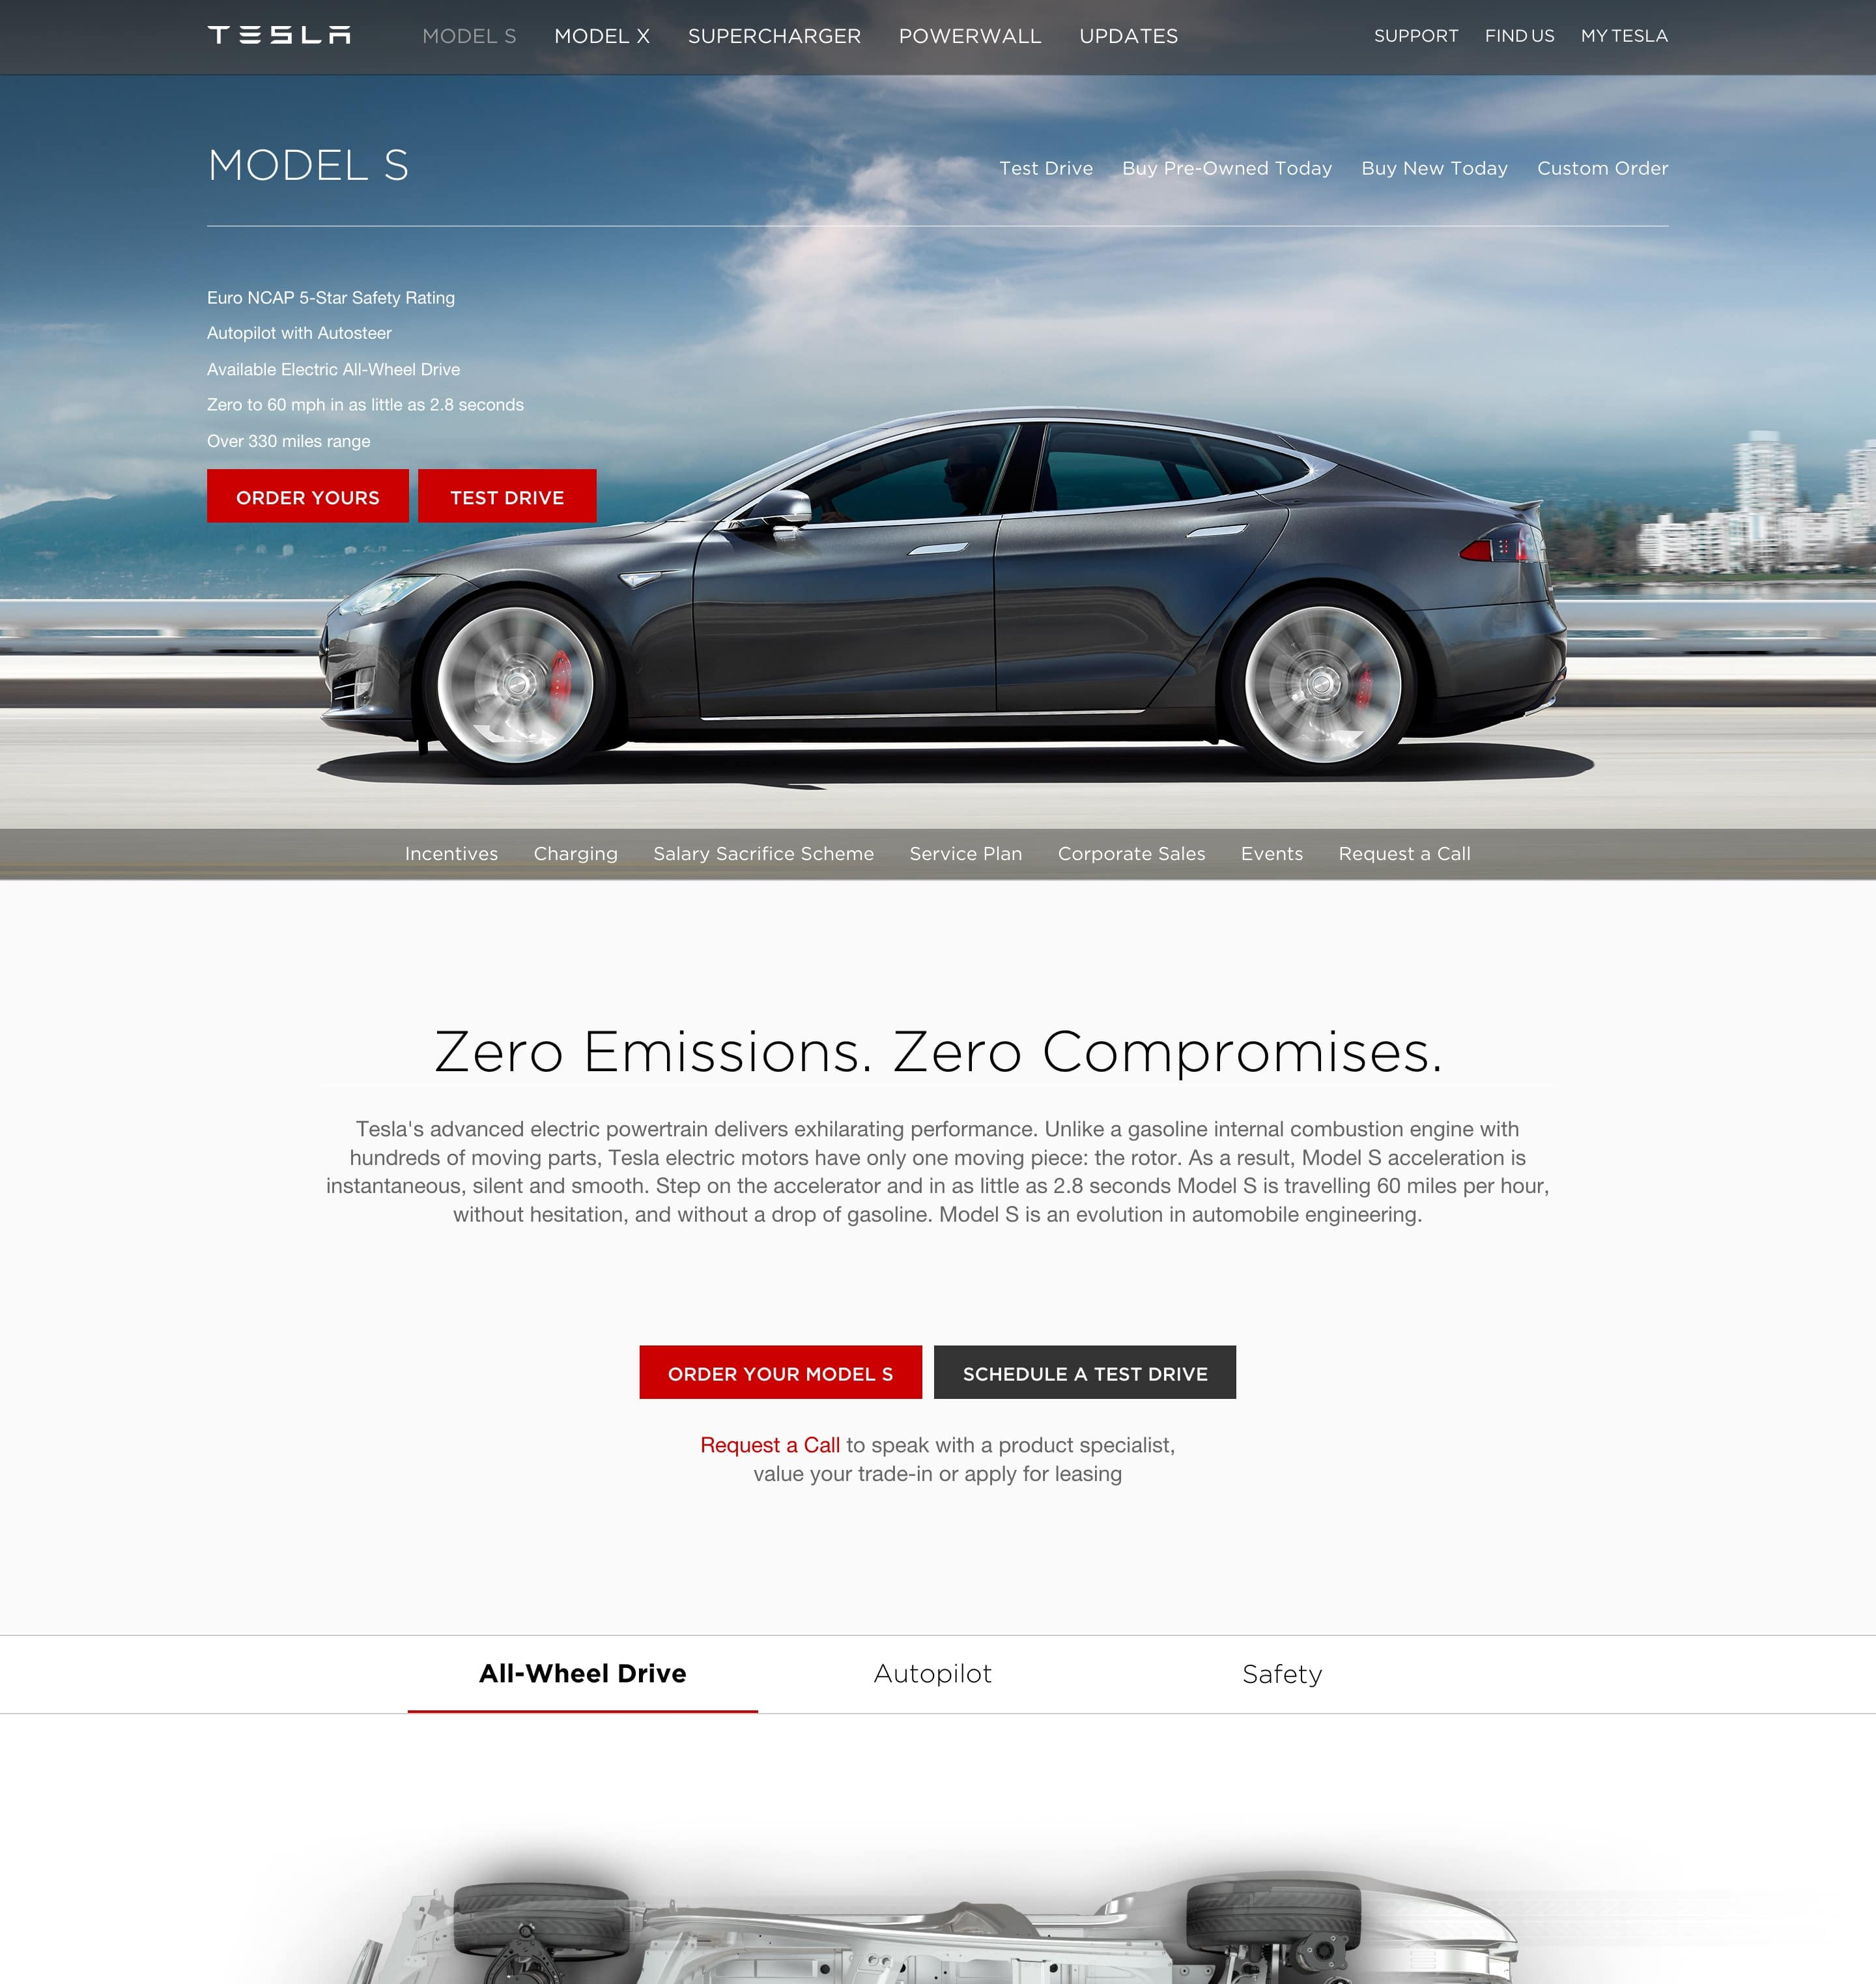 Tesla's Model S page